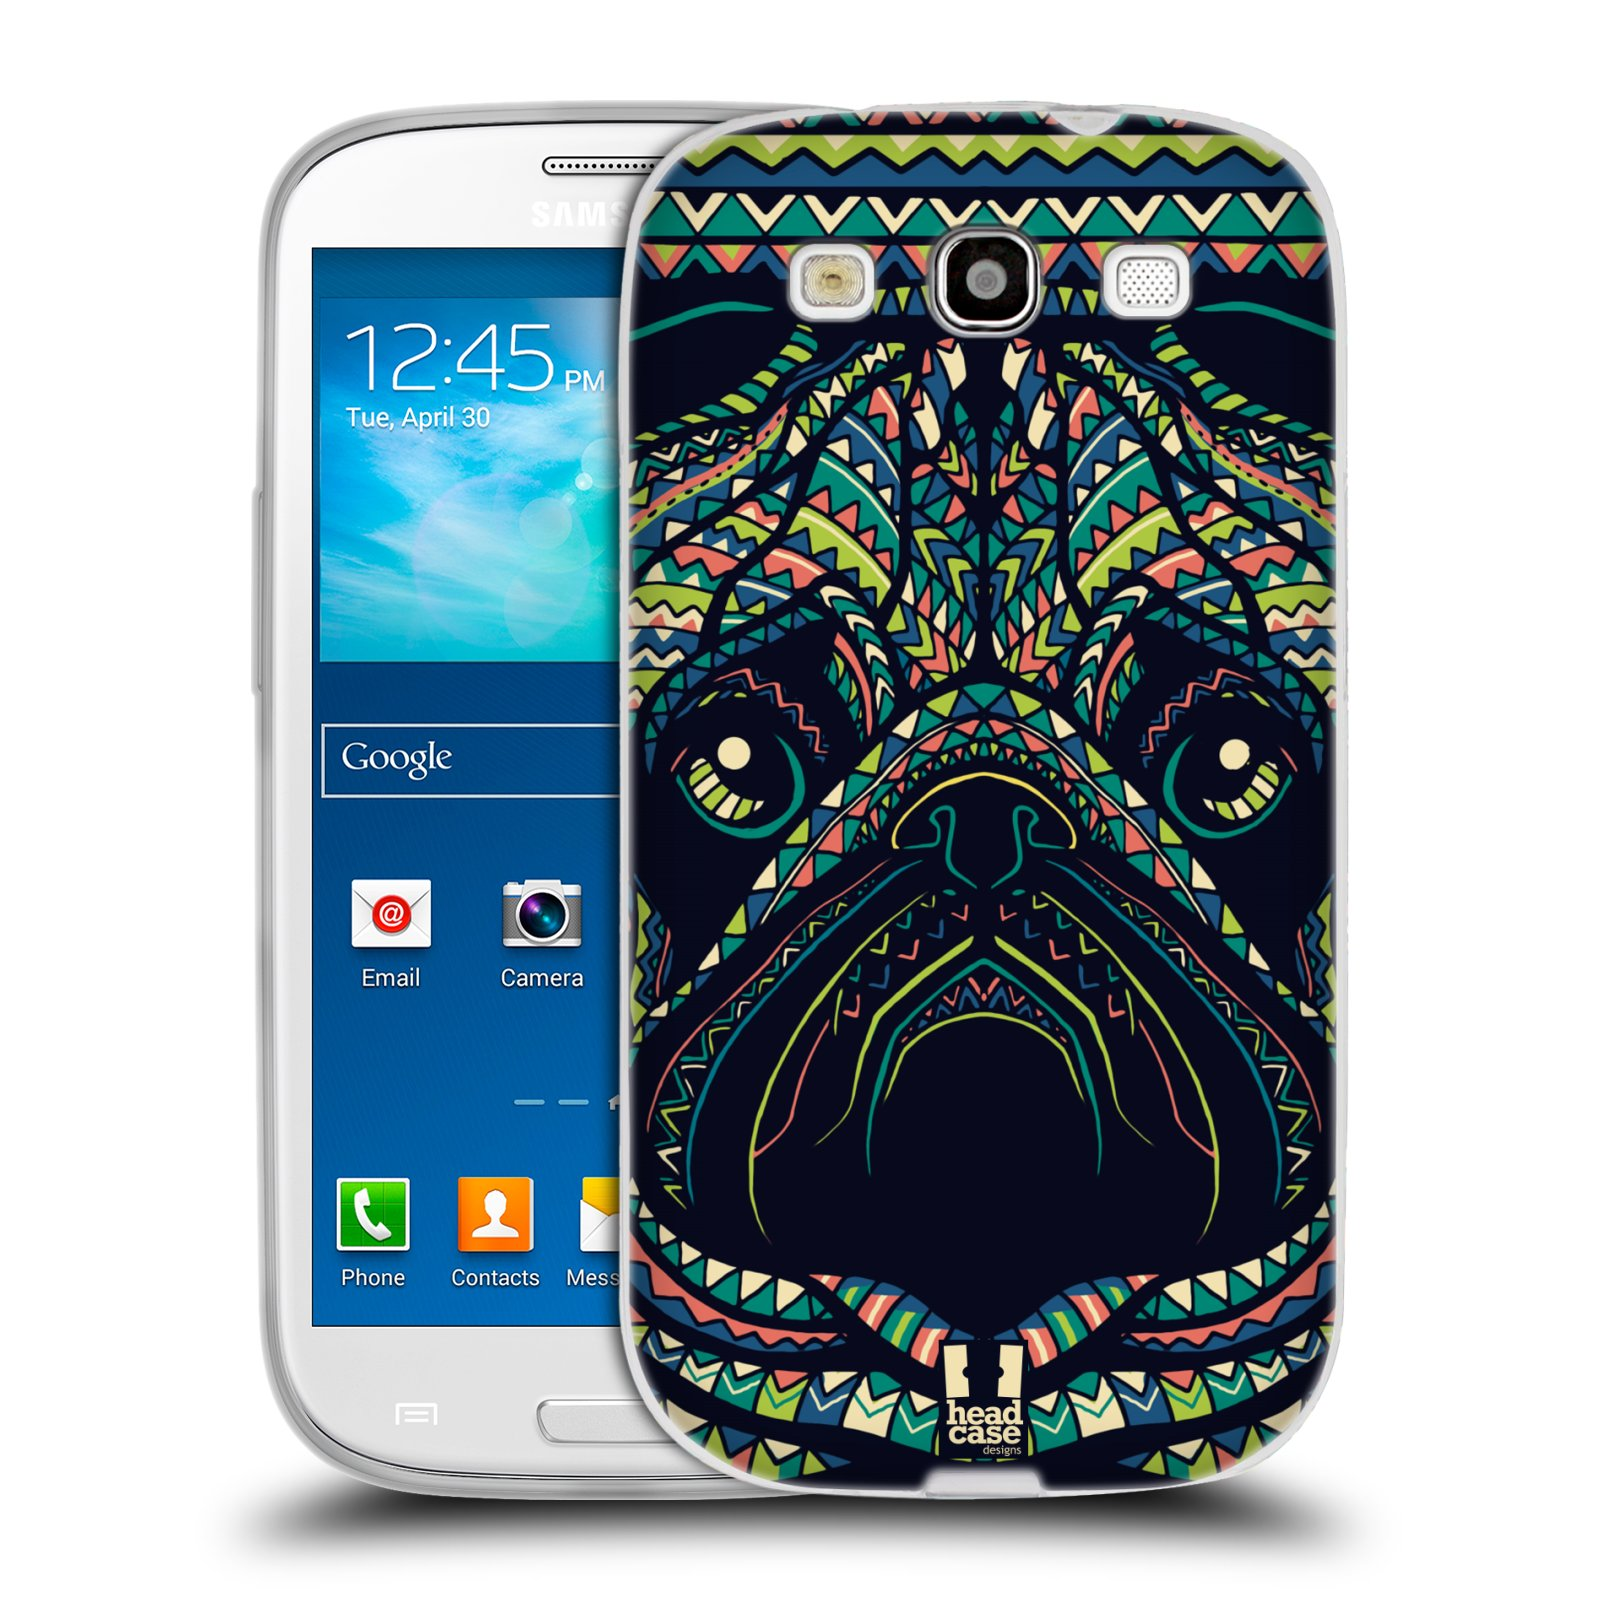 HEAD CASE silikonový obal na mobil Samsung Galaxy S3 i9300 vzor Aztécký motiv zvíře 3 mopsík